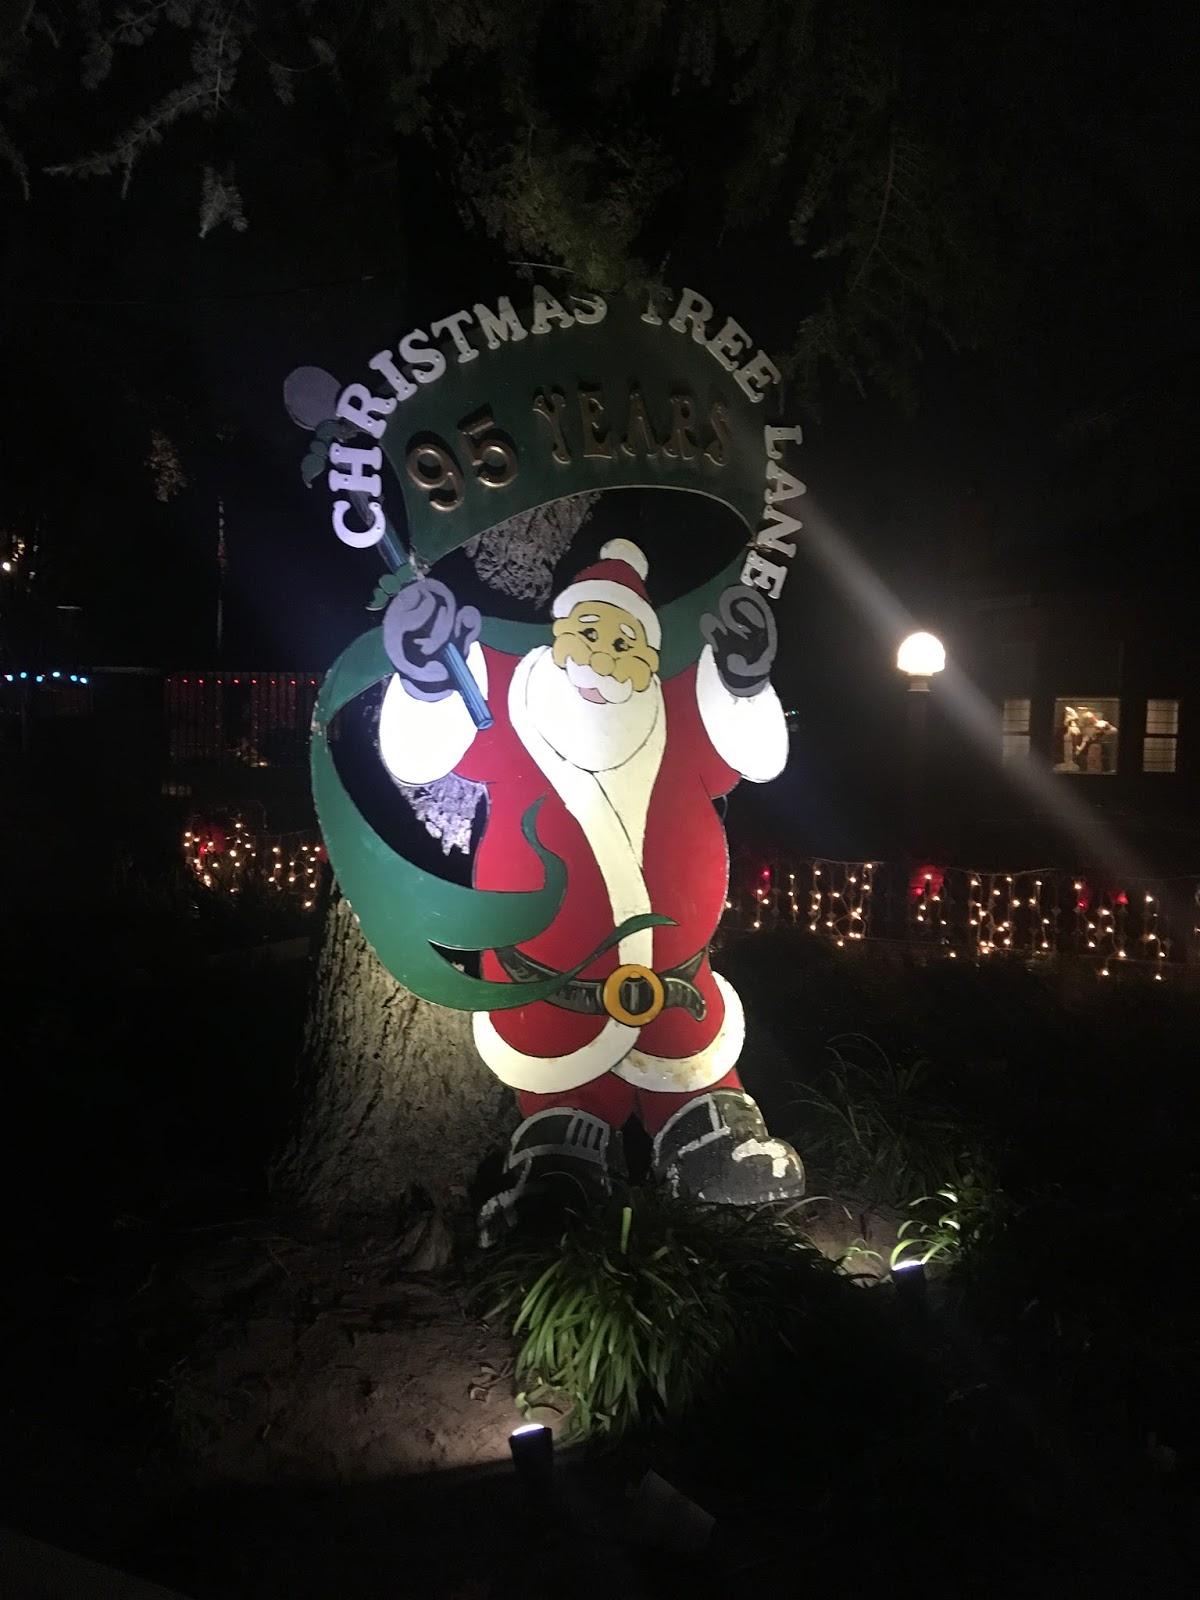 95th Christmas Tree Lane (Van Ness Boulevard, Fresno, CA)